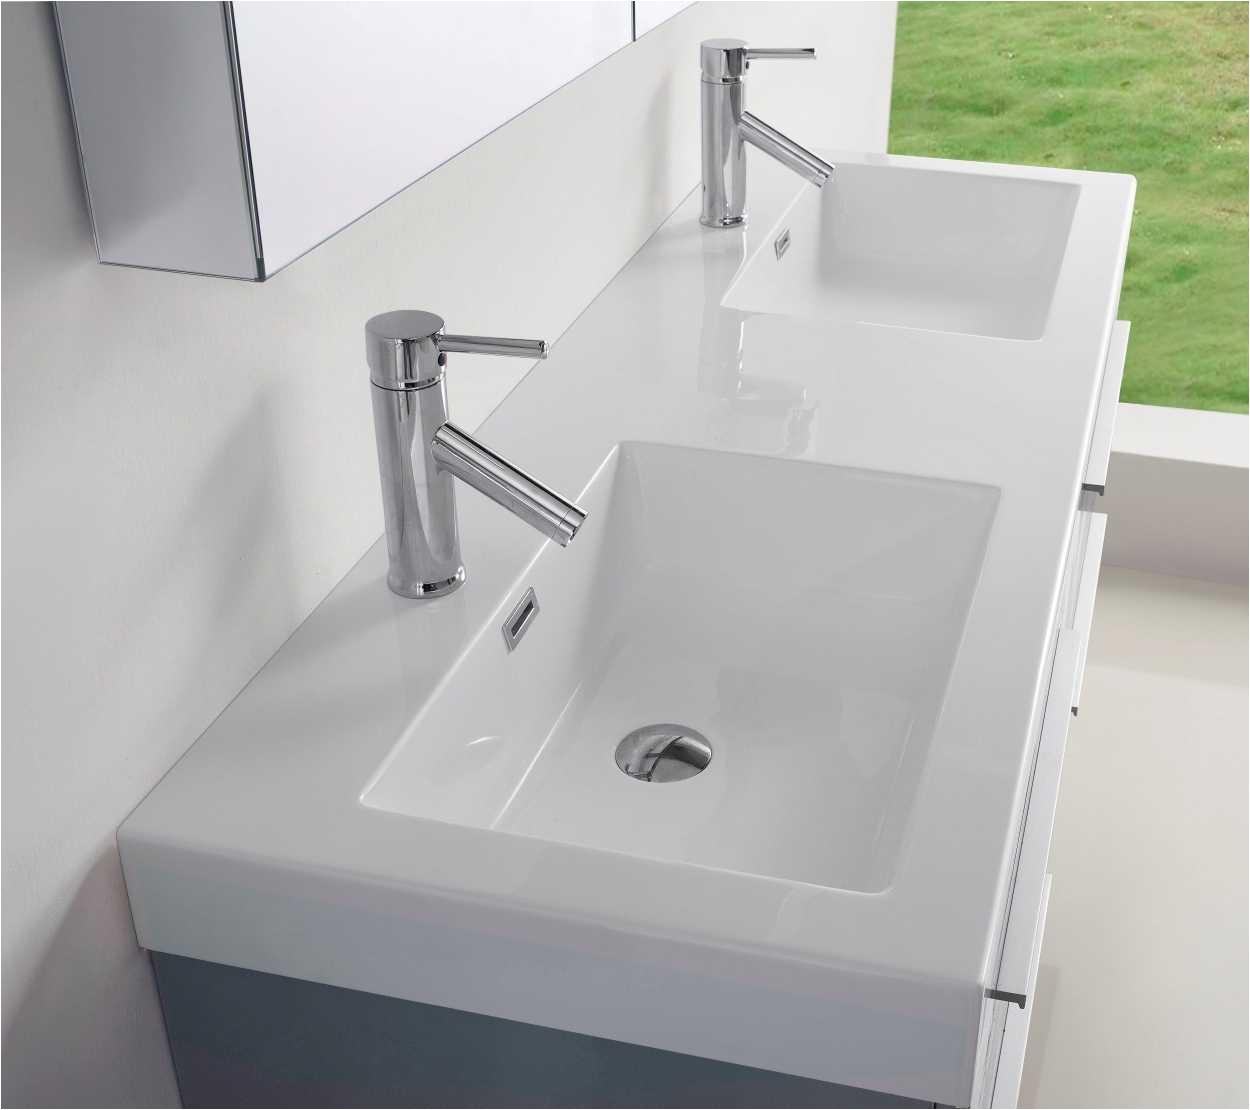 bathroom interior design images jd gr 5h sink 54 double vanity bathroom grey view detailed 5